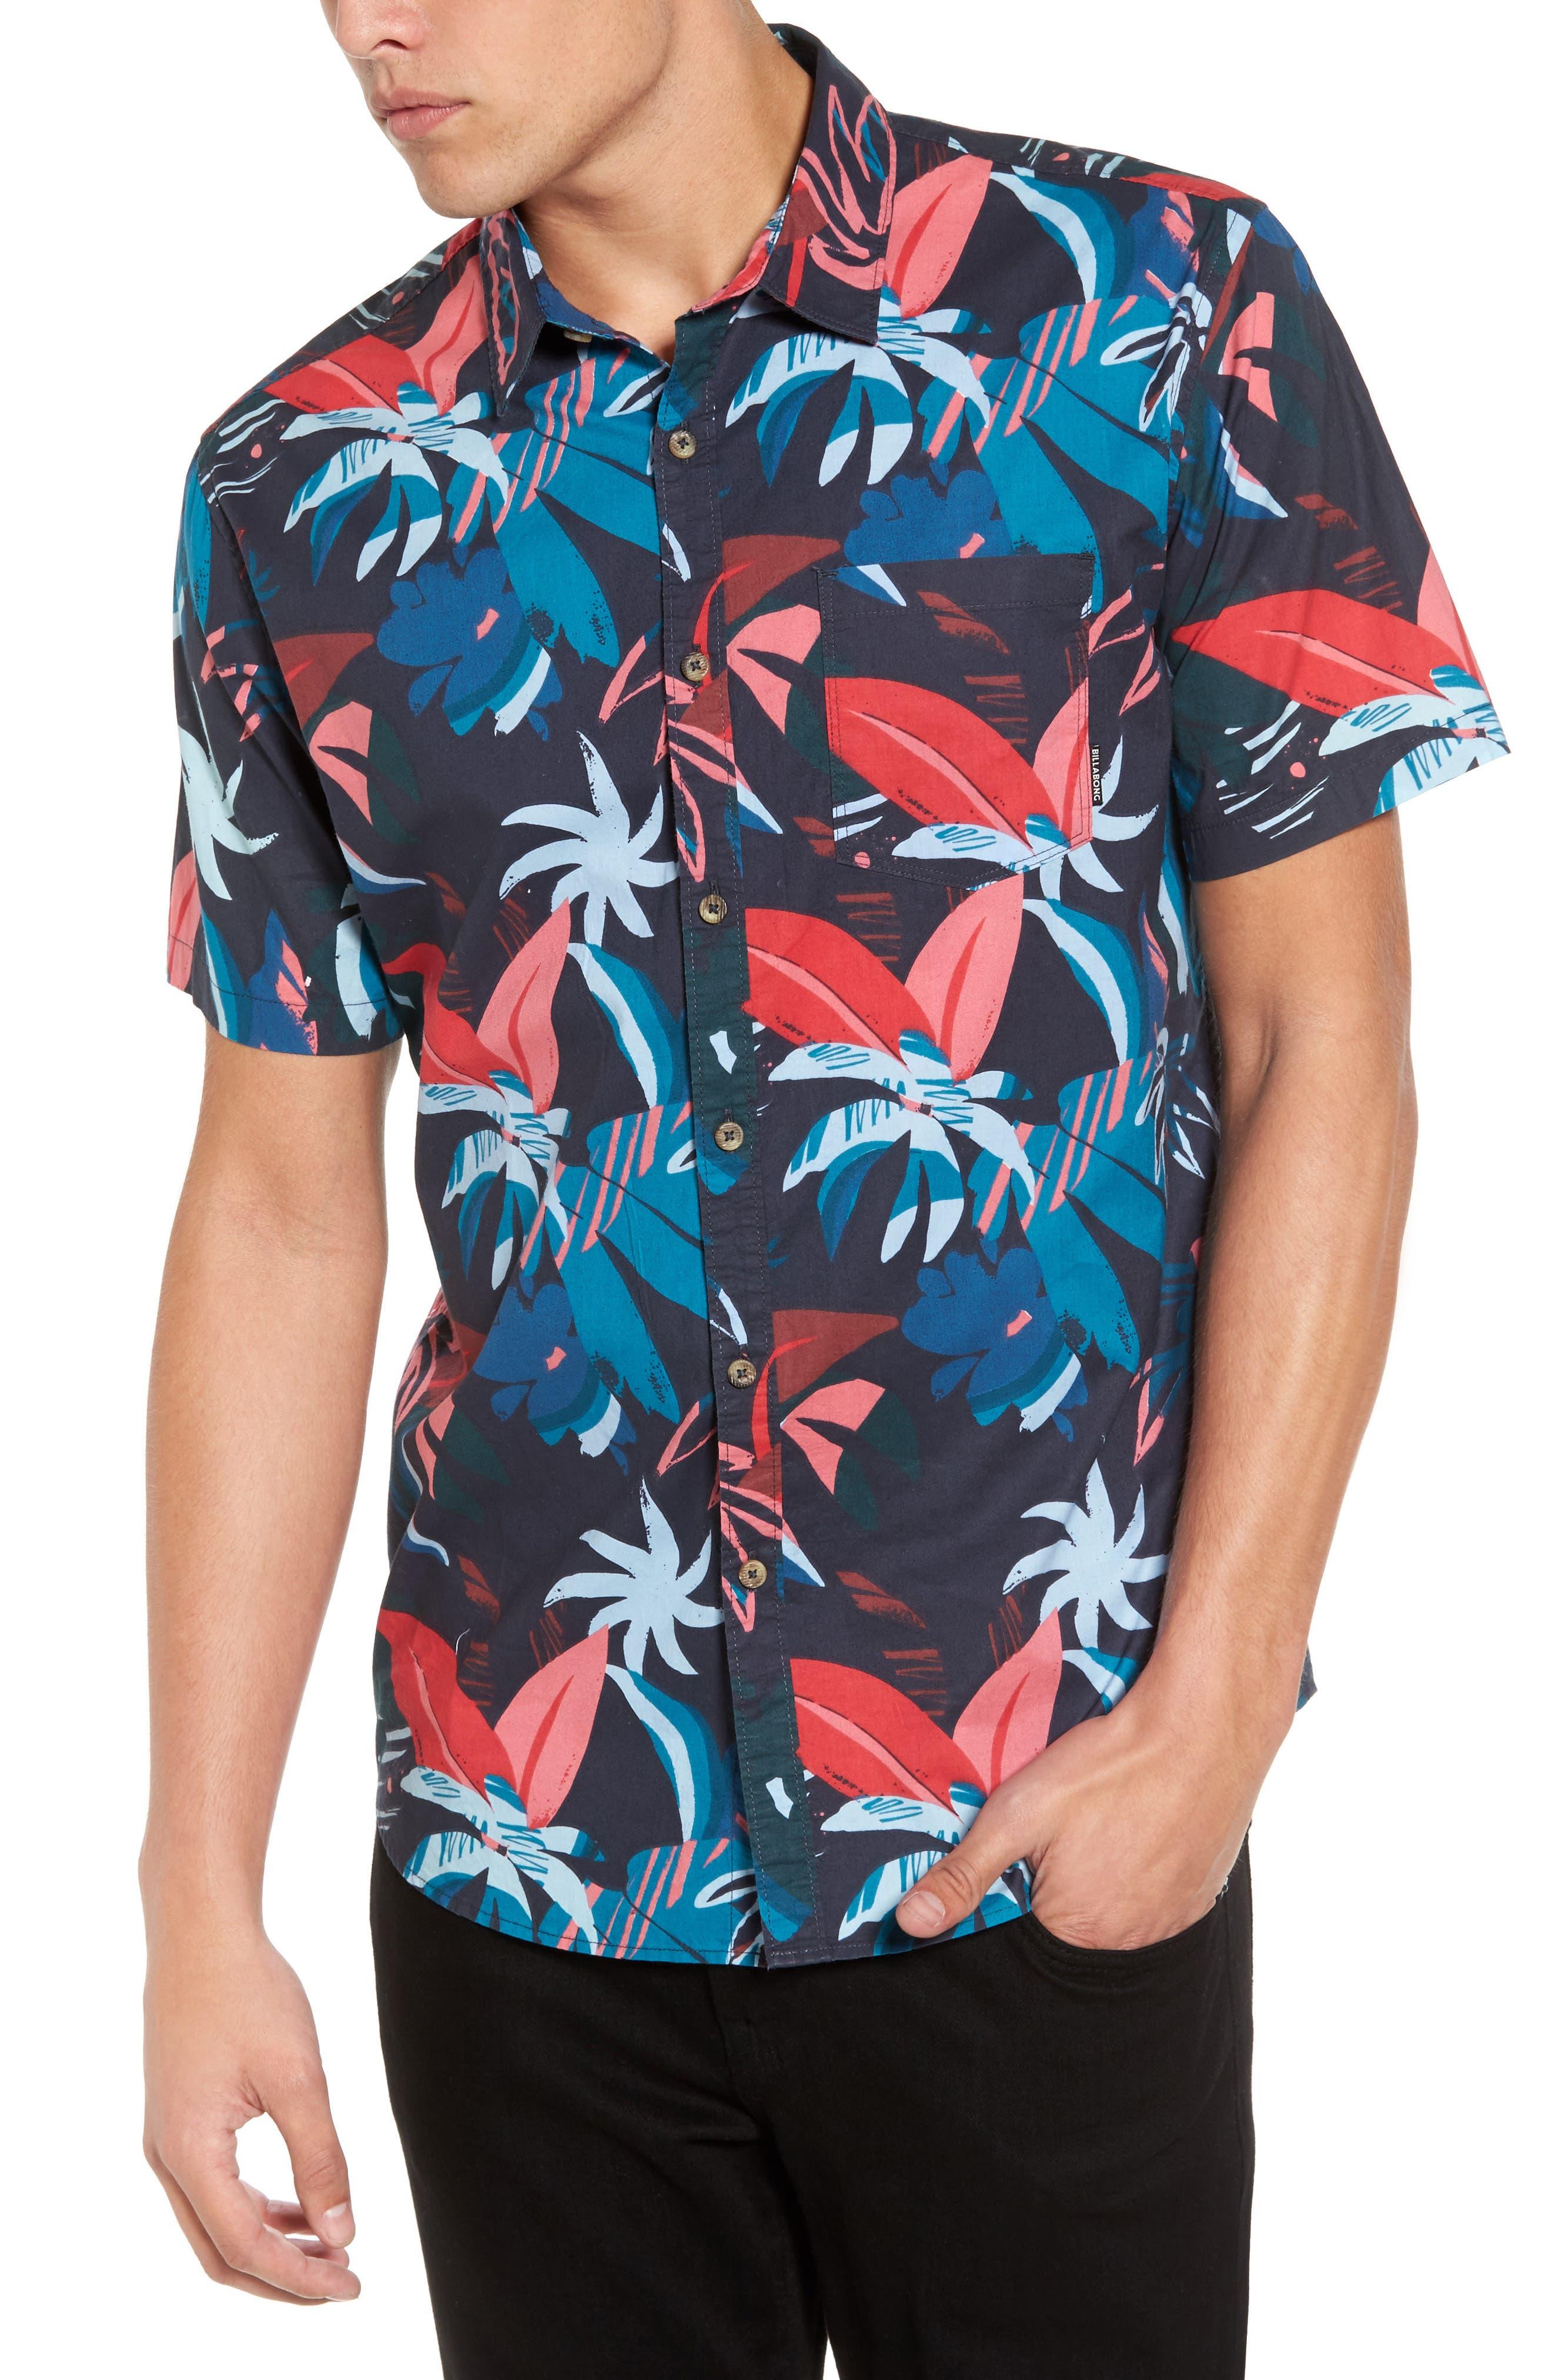 Main Image - Billabong Sundays Woven Shirt